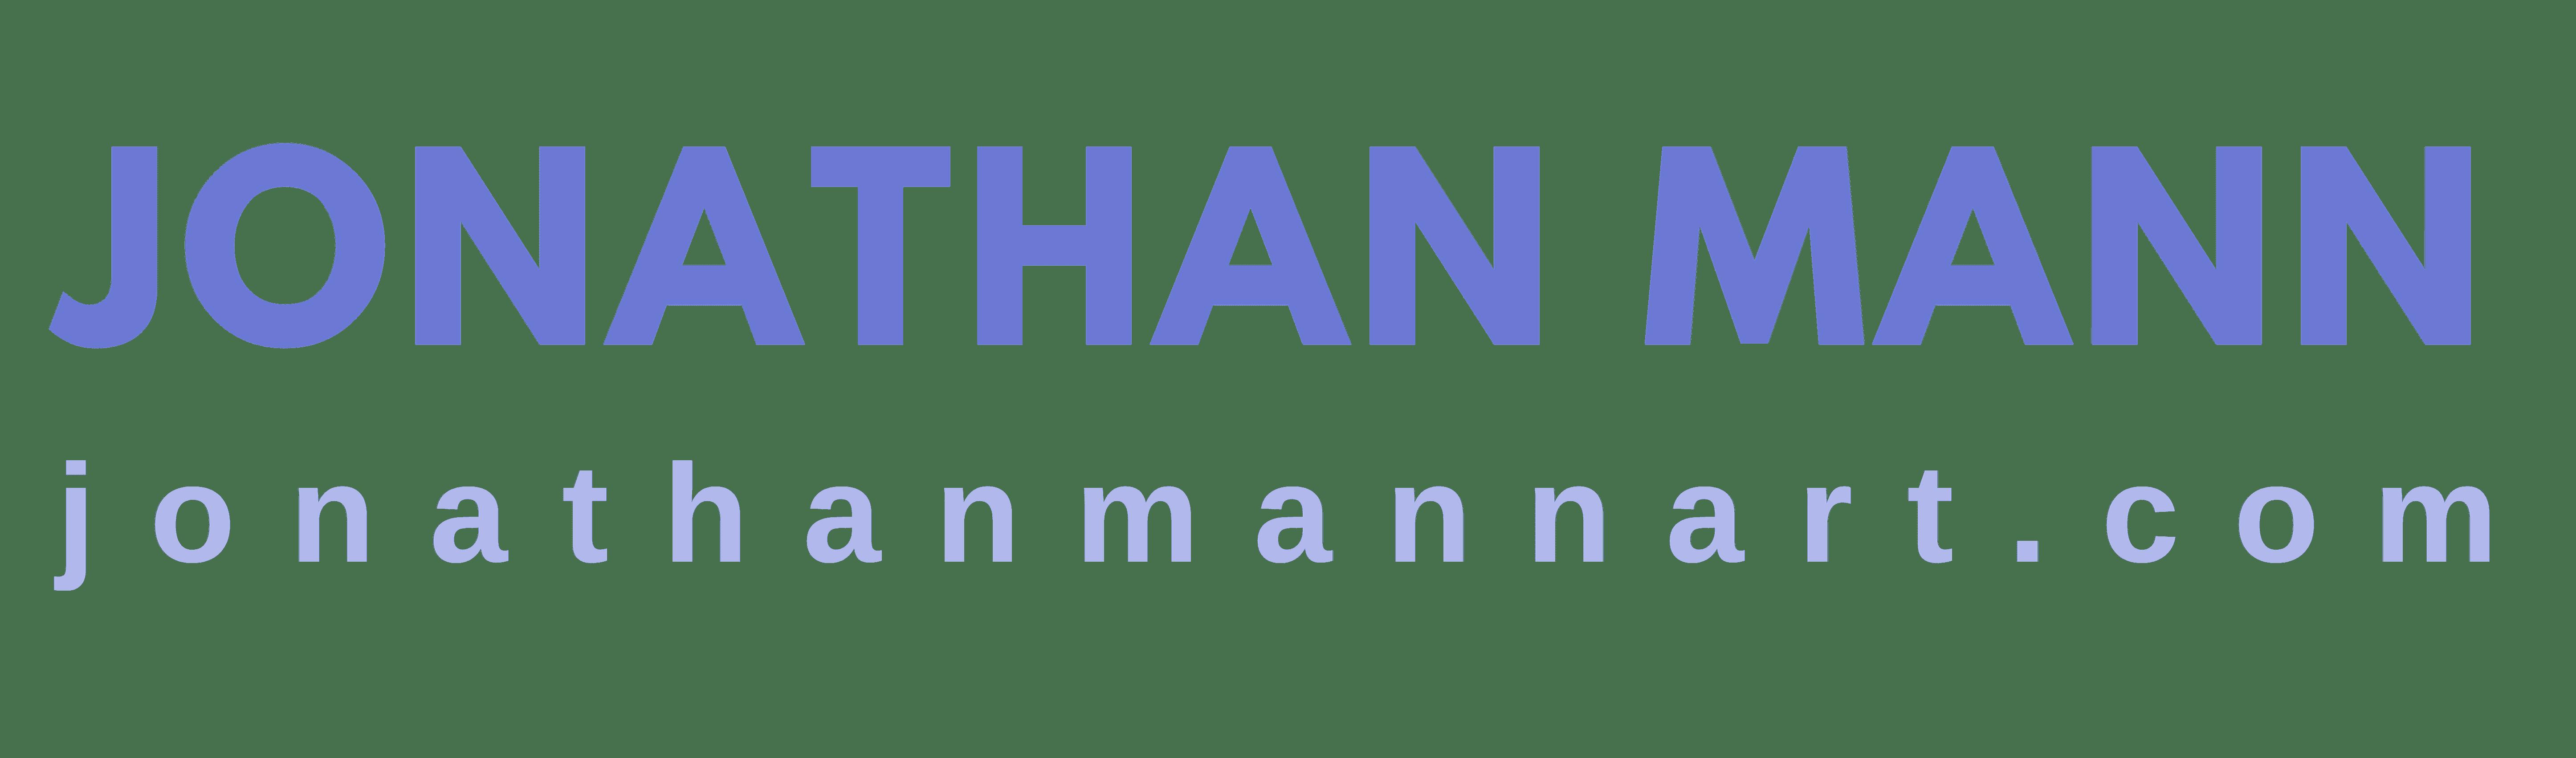 jonathanmann